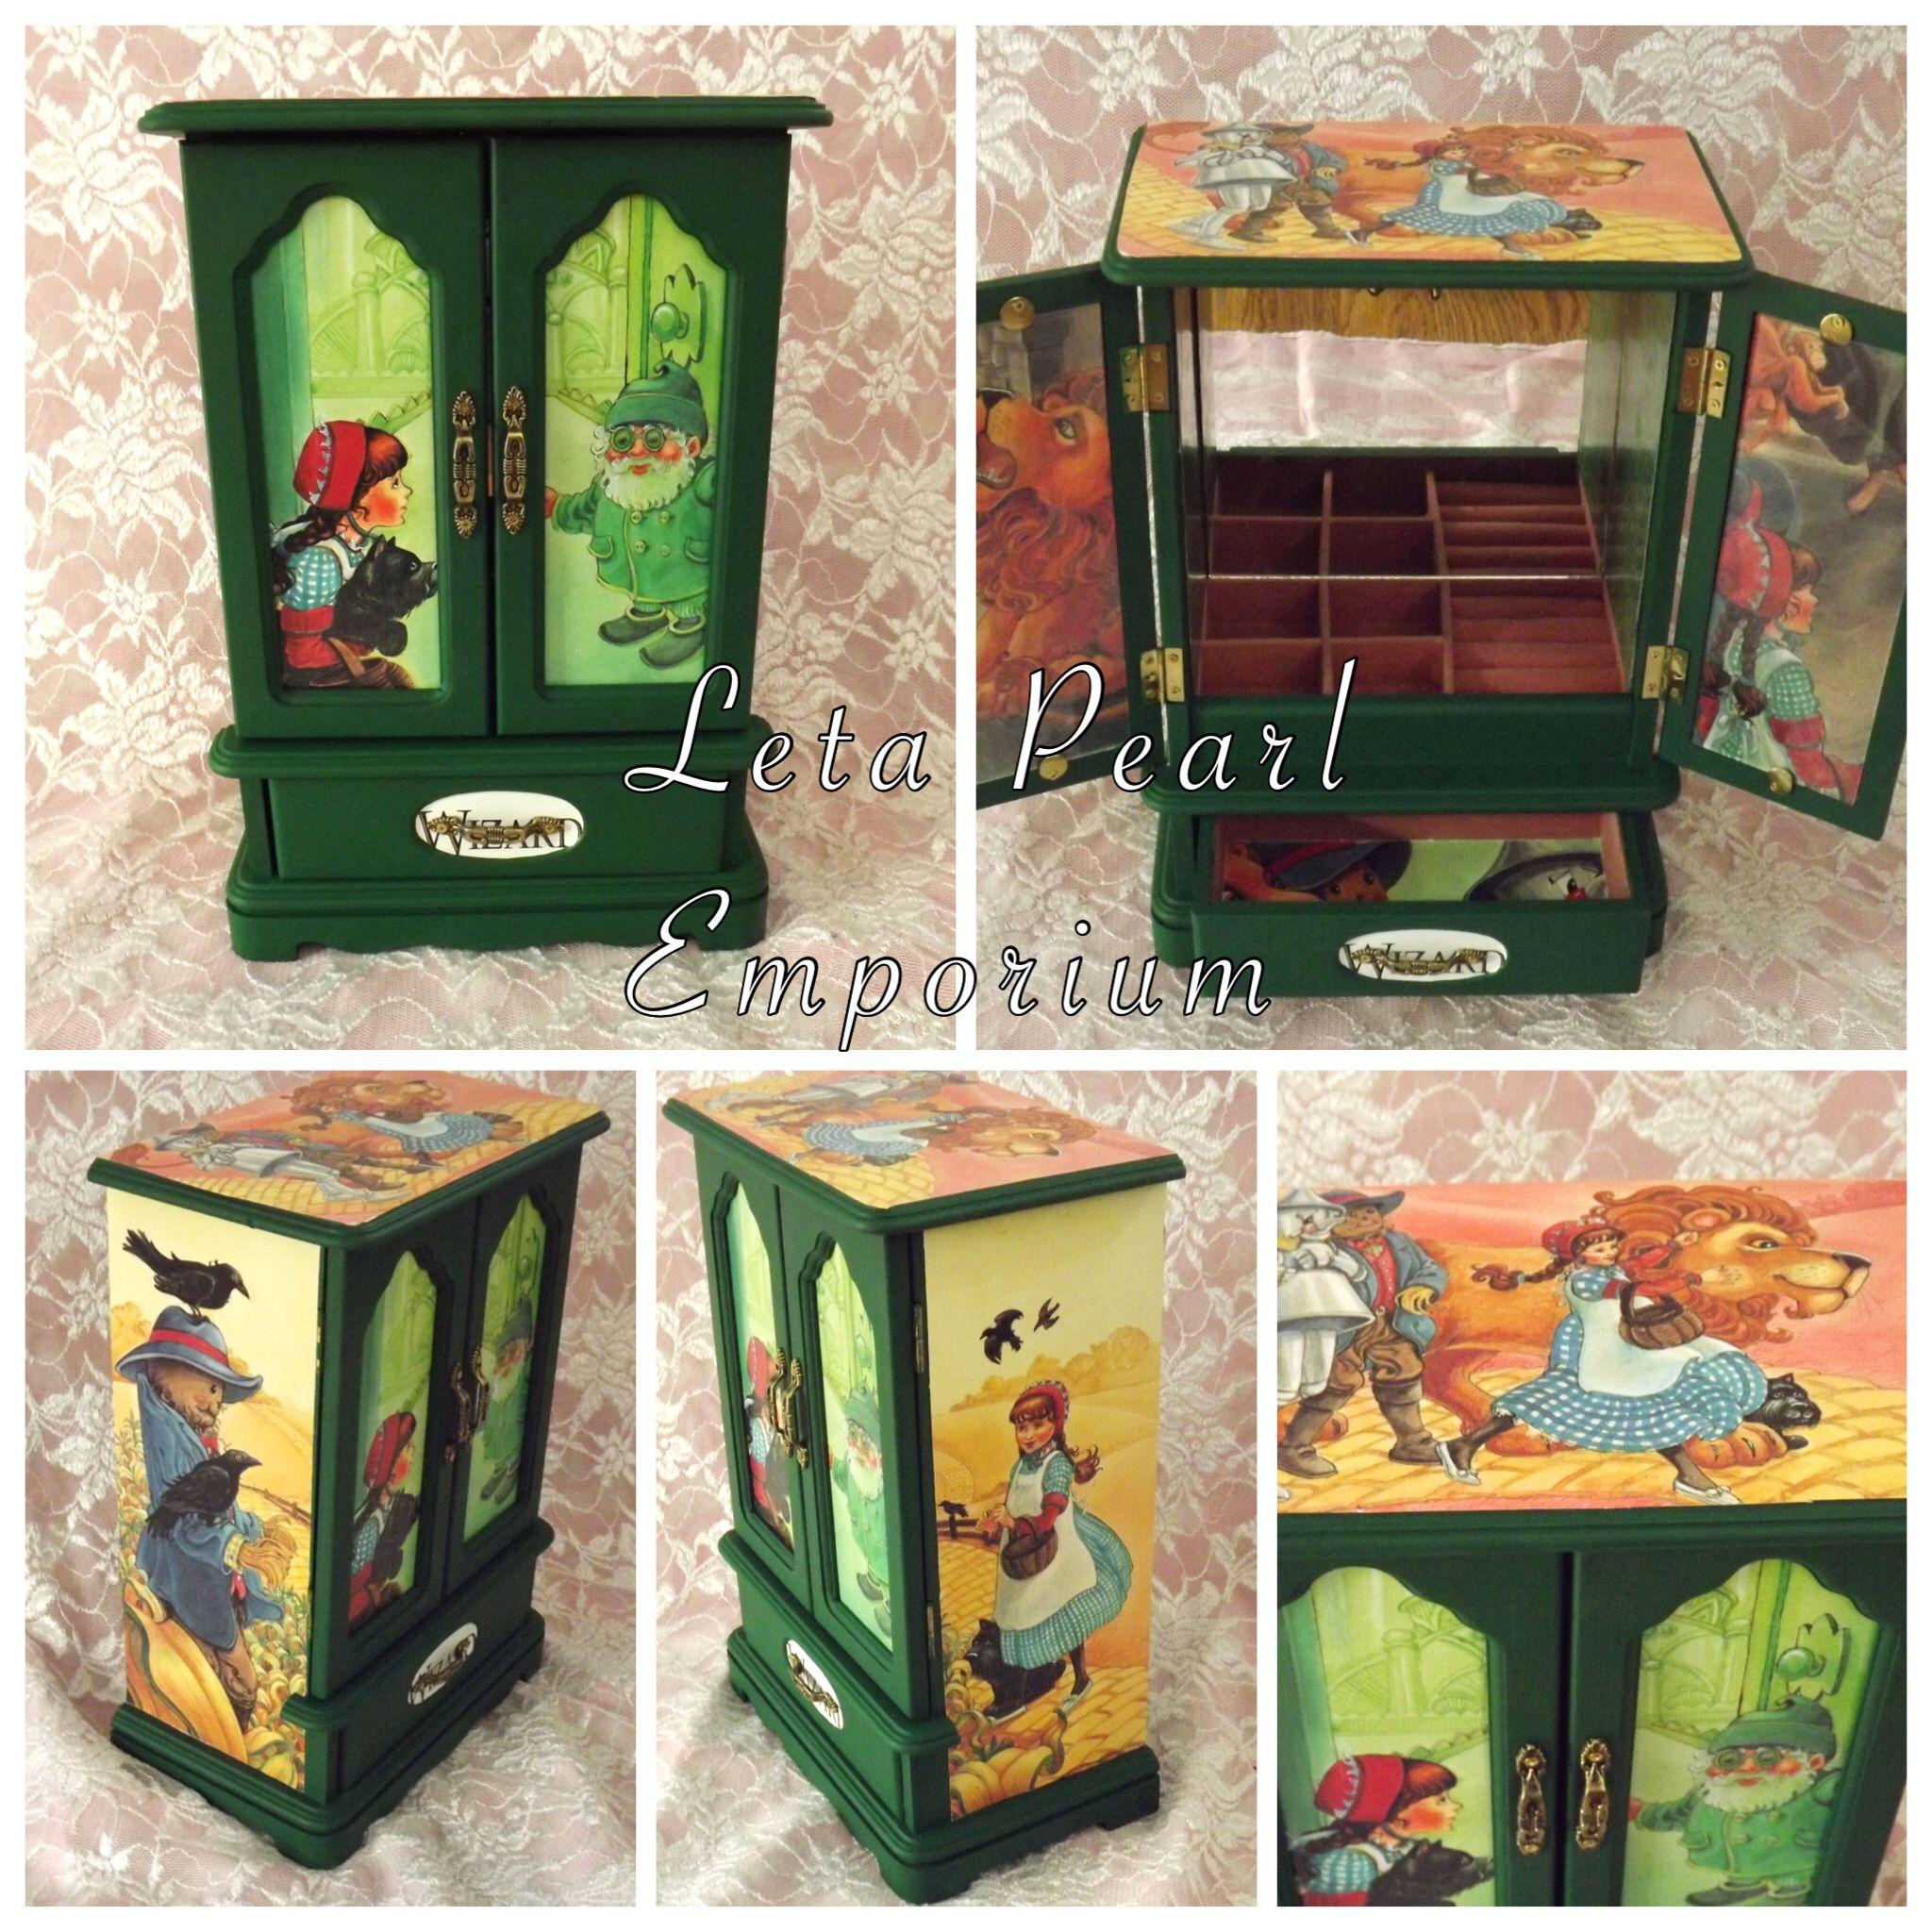 Wizard Of Oz jewelry box Letapearlemporium Etsy shop Leta Pearl